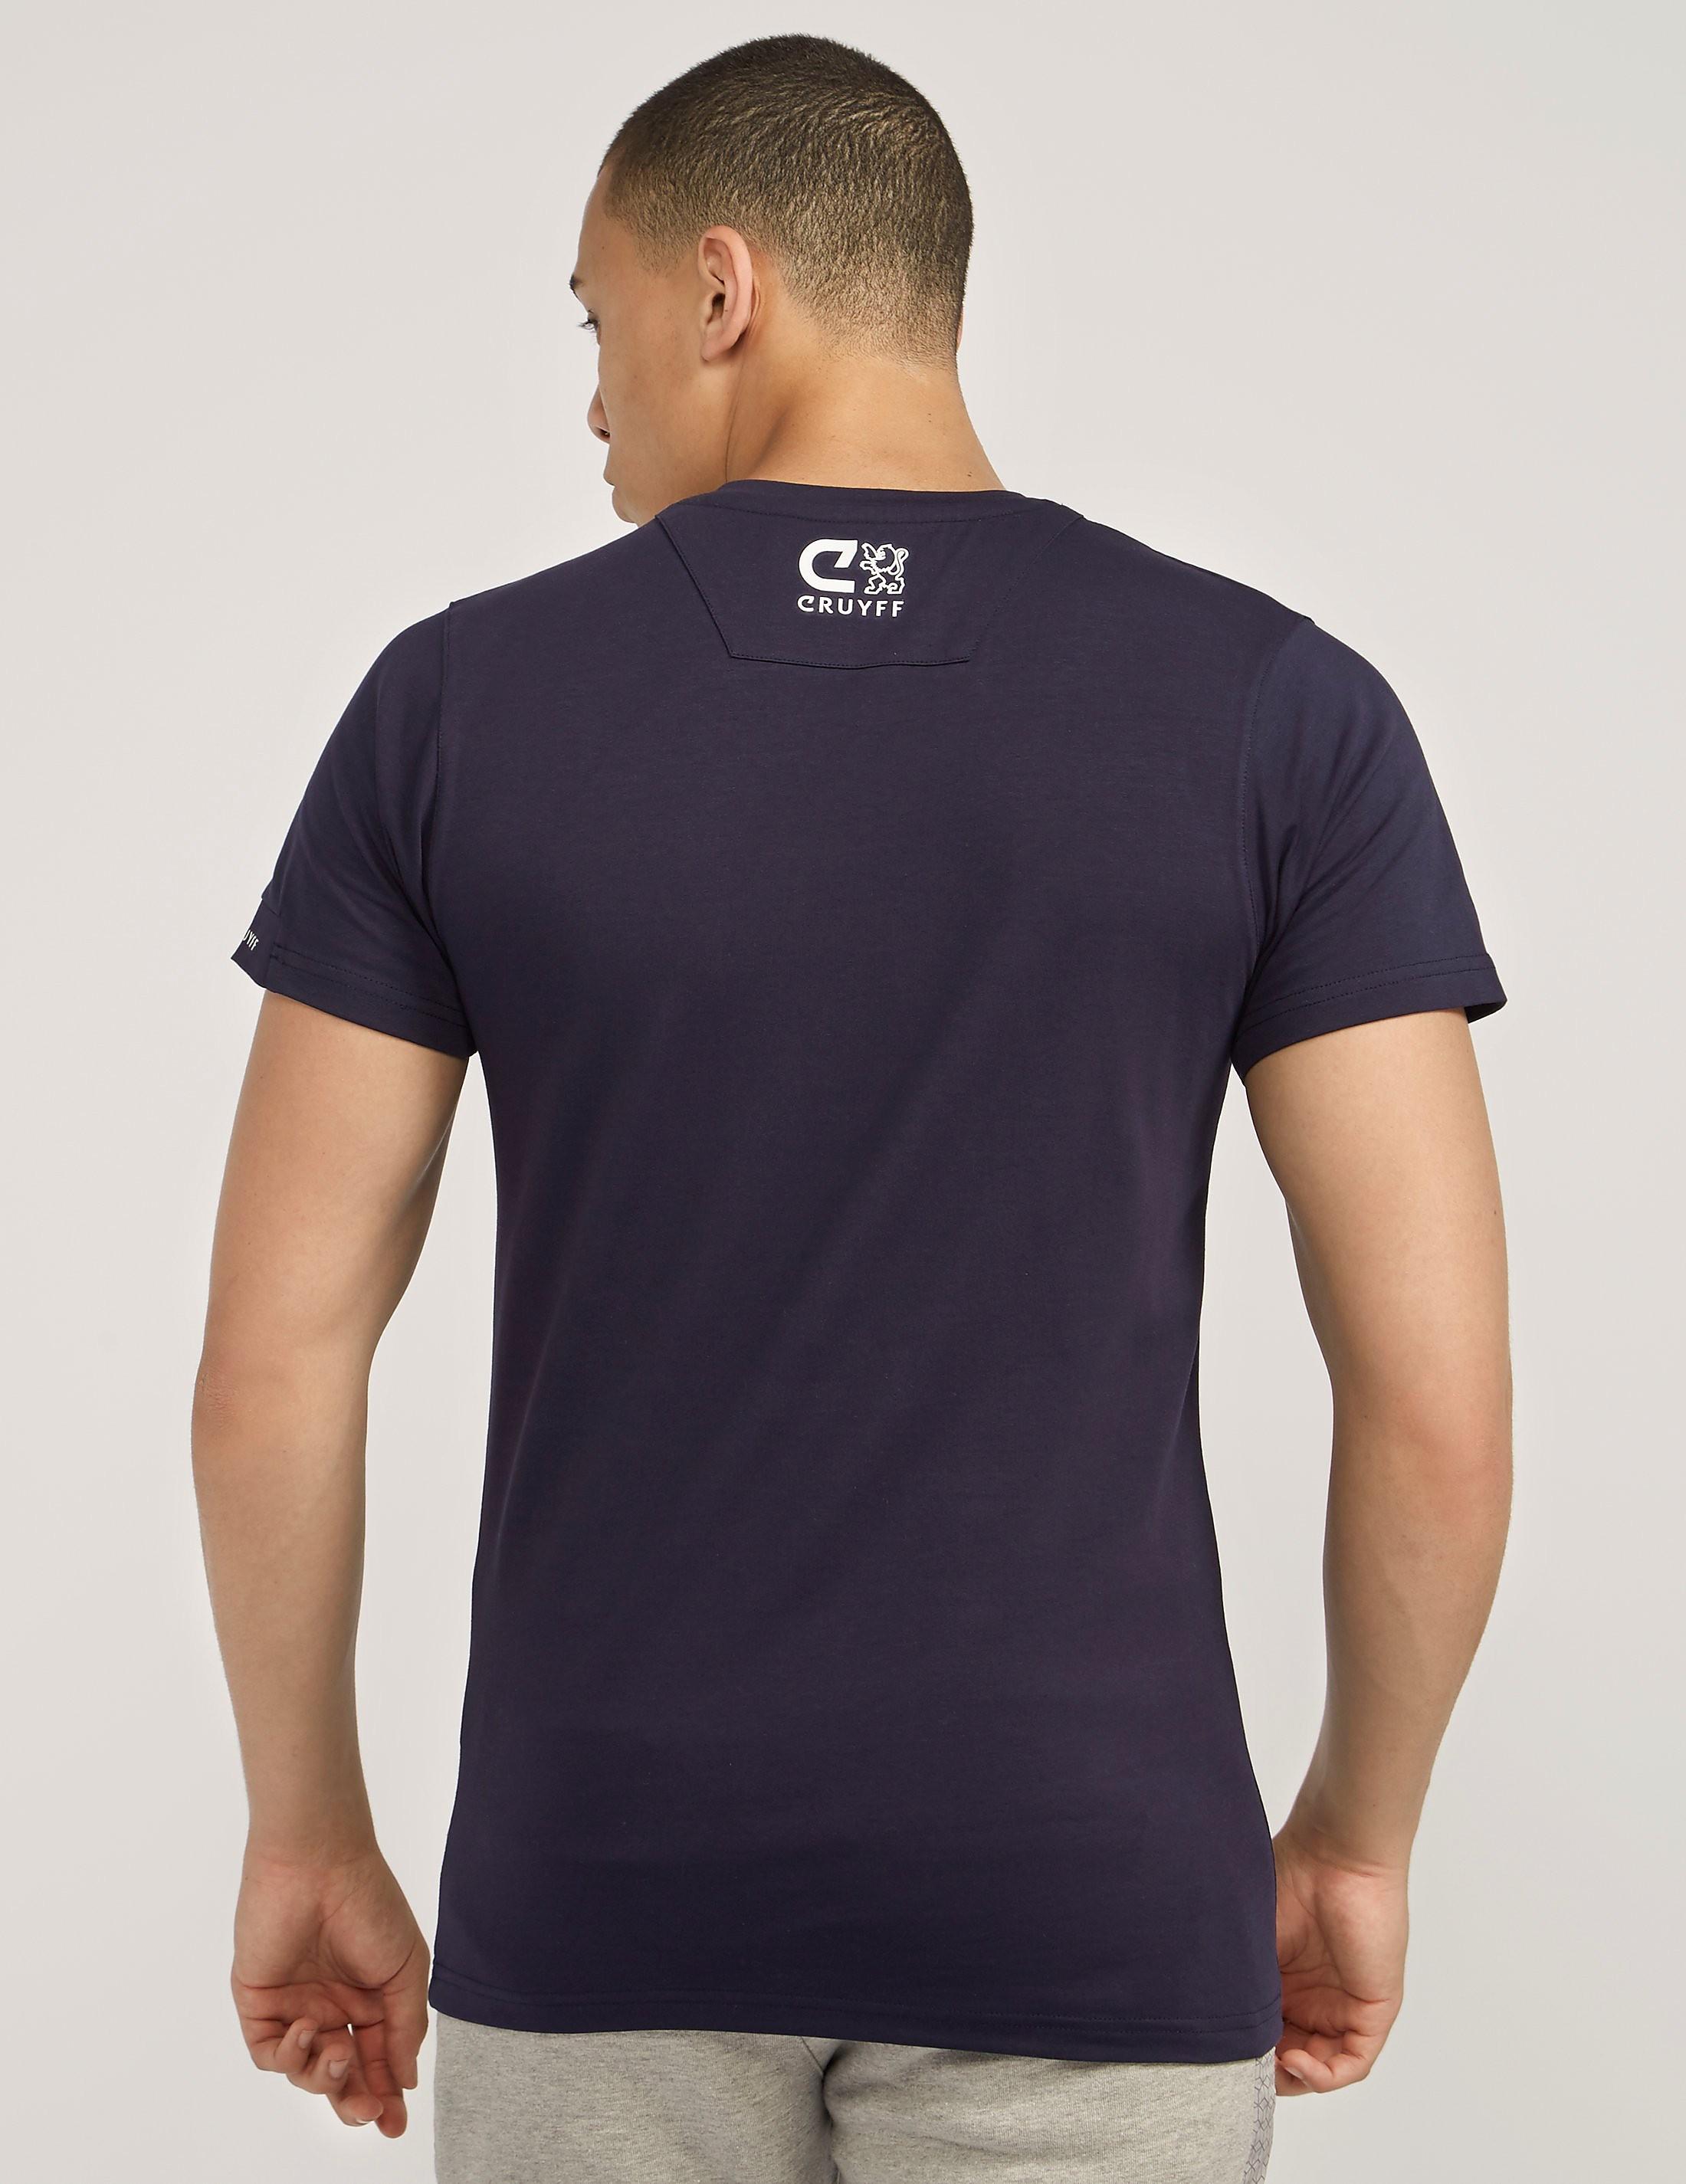 Cruyff Turner T-Shirt